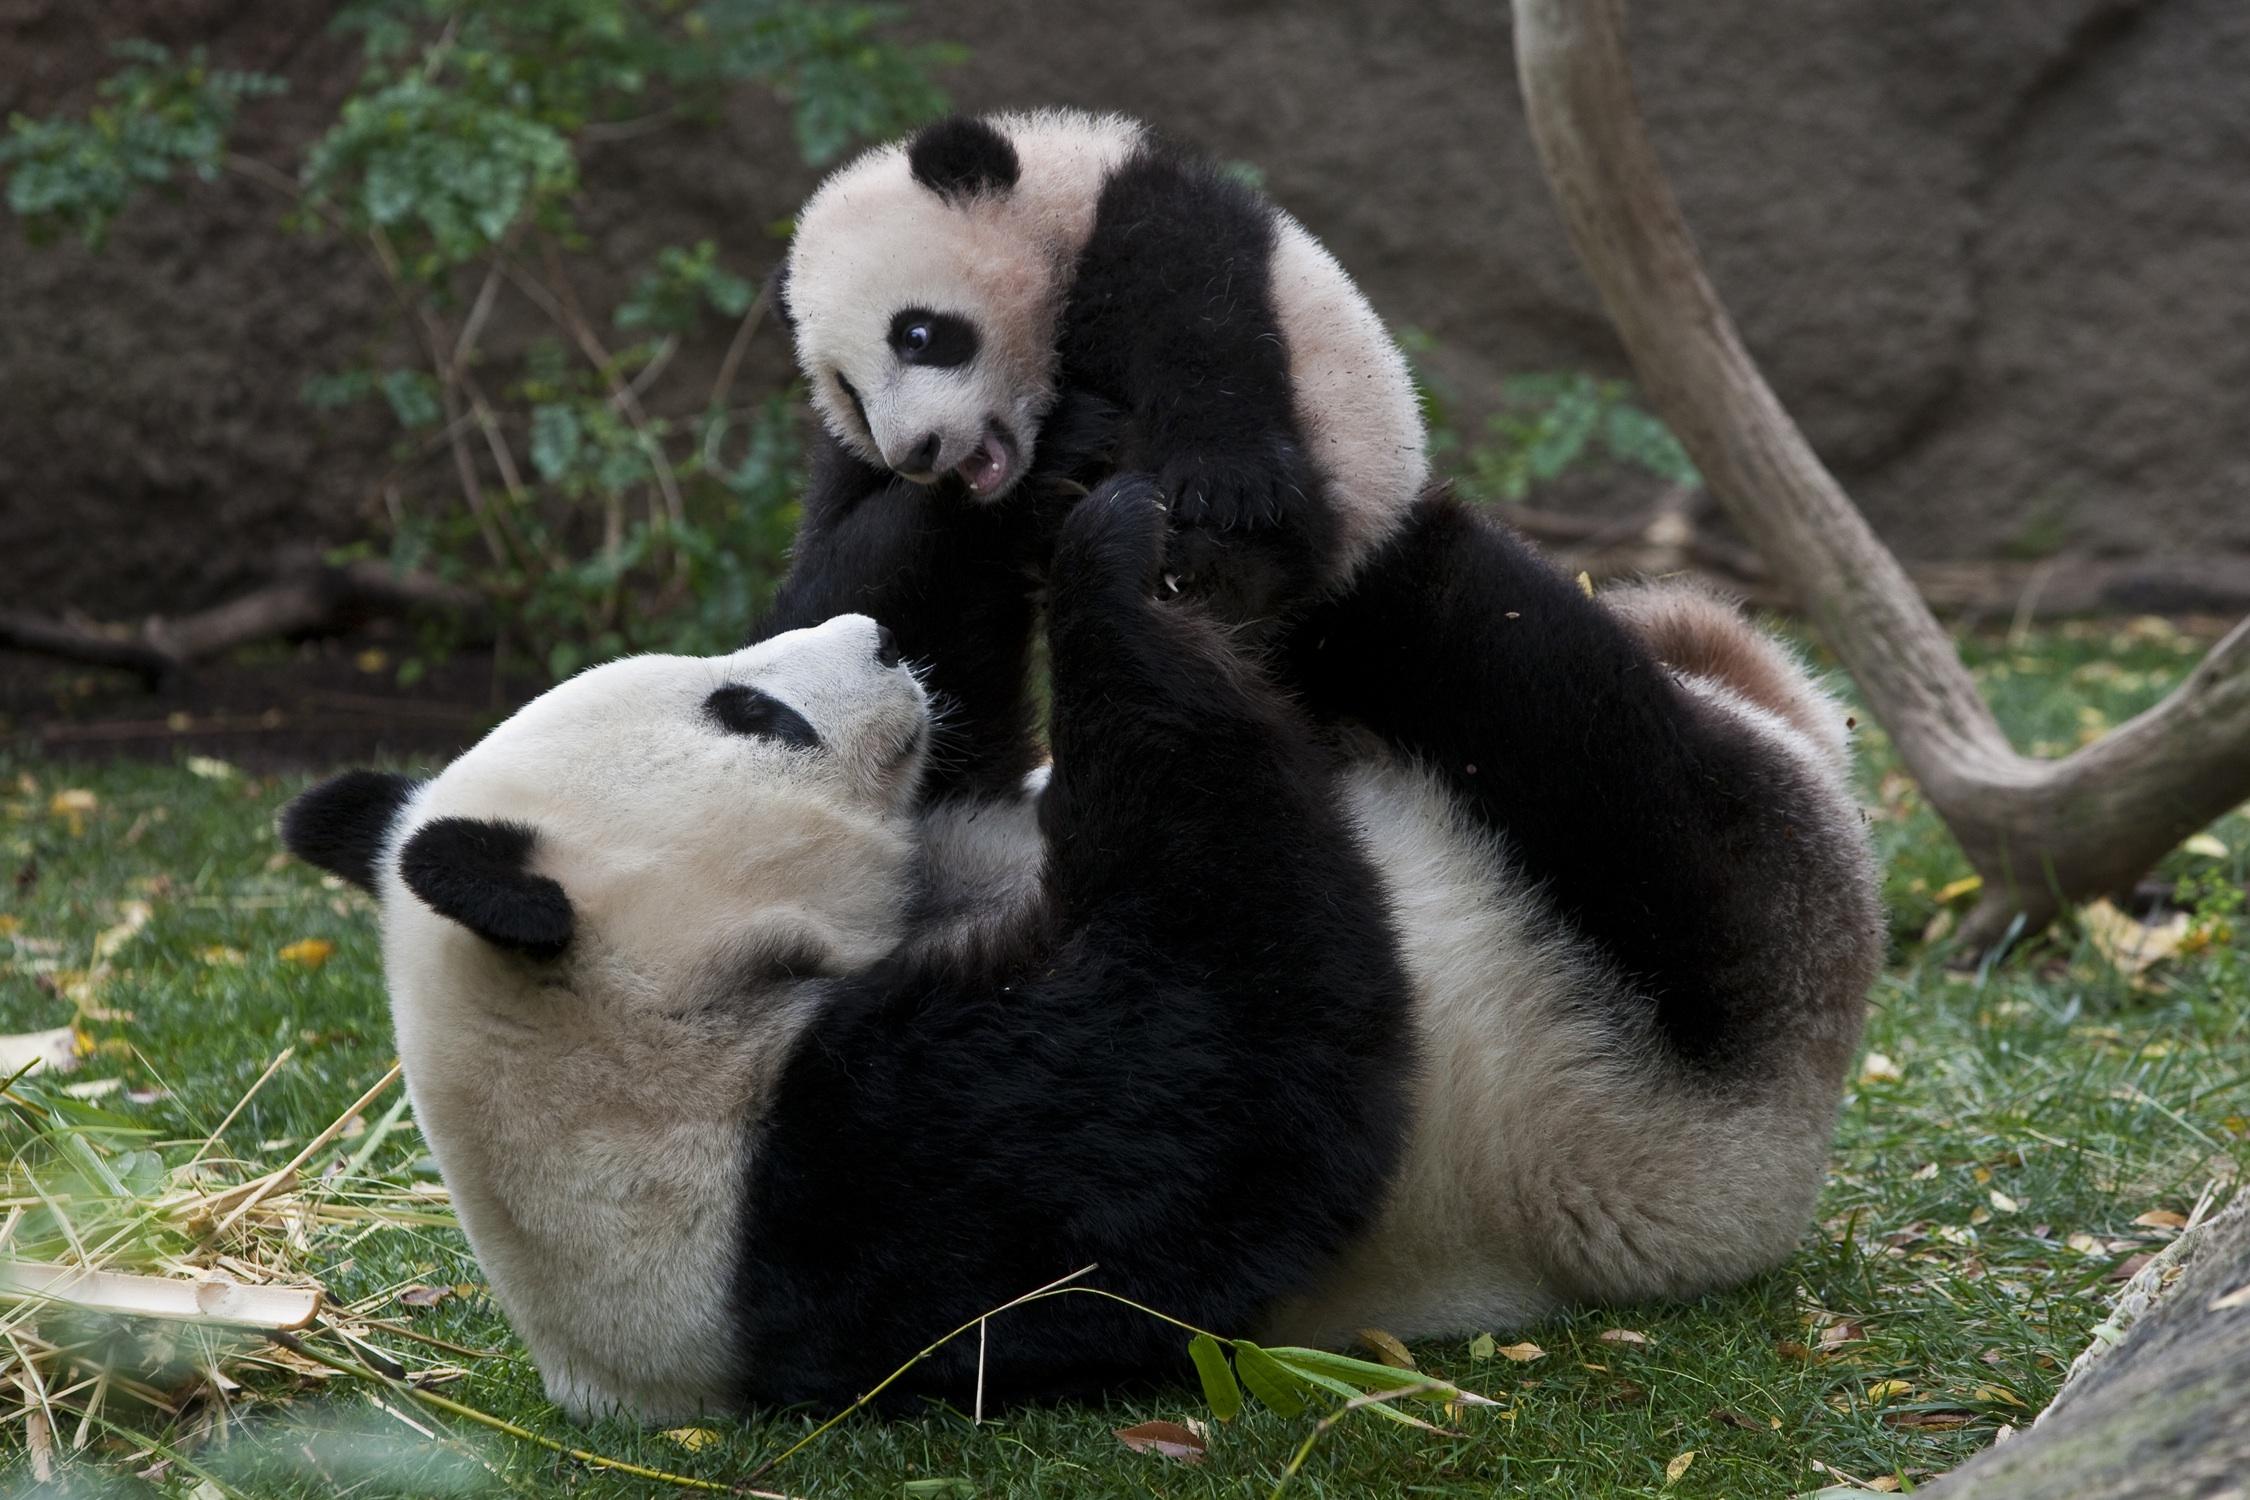 Cute Pandas Pandas Photo 35203715 Fanpop